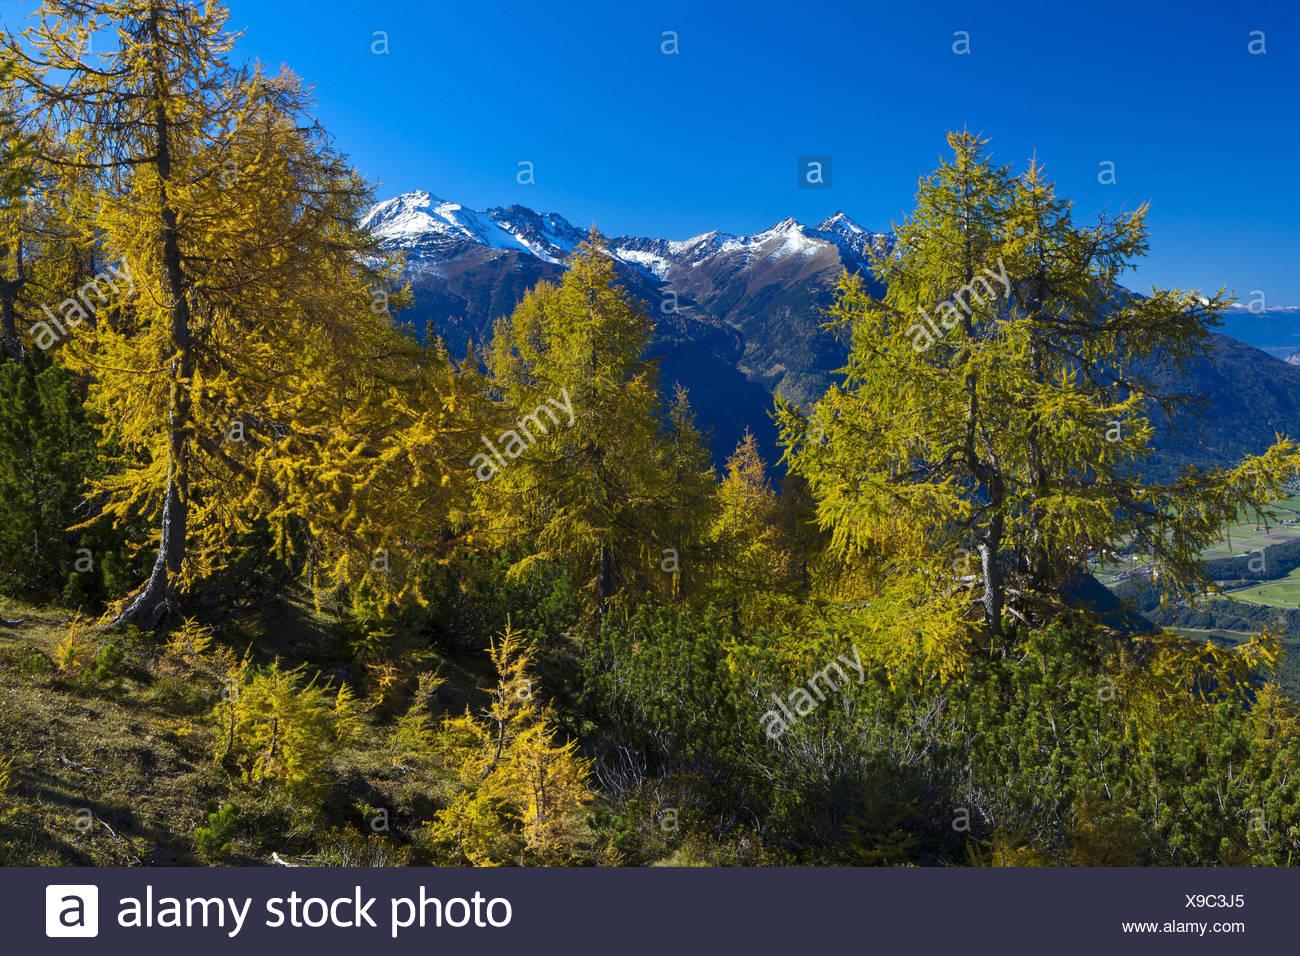 Austria, Tyrol, Mieminger plateau, Obsteig, Simmering, - Stock Image